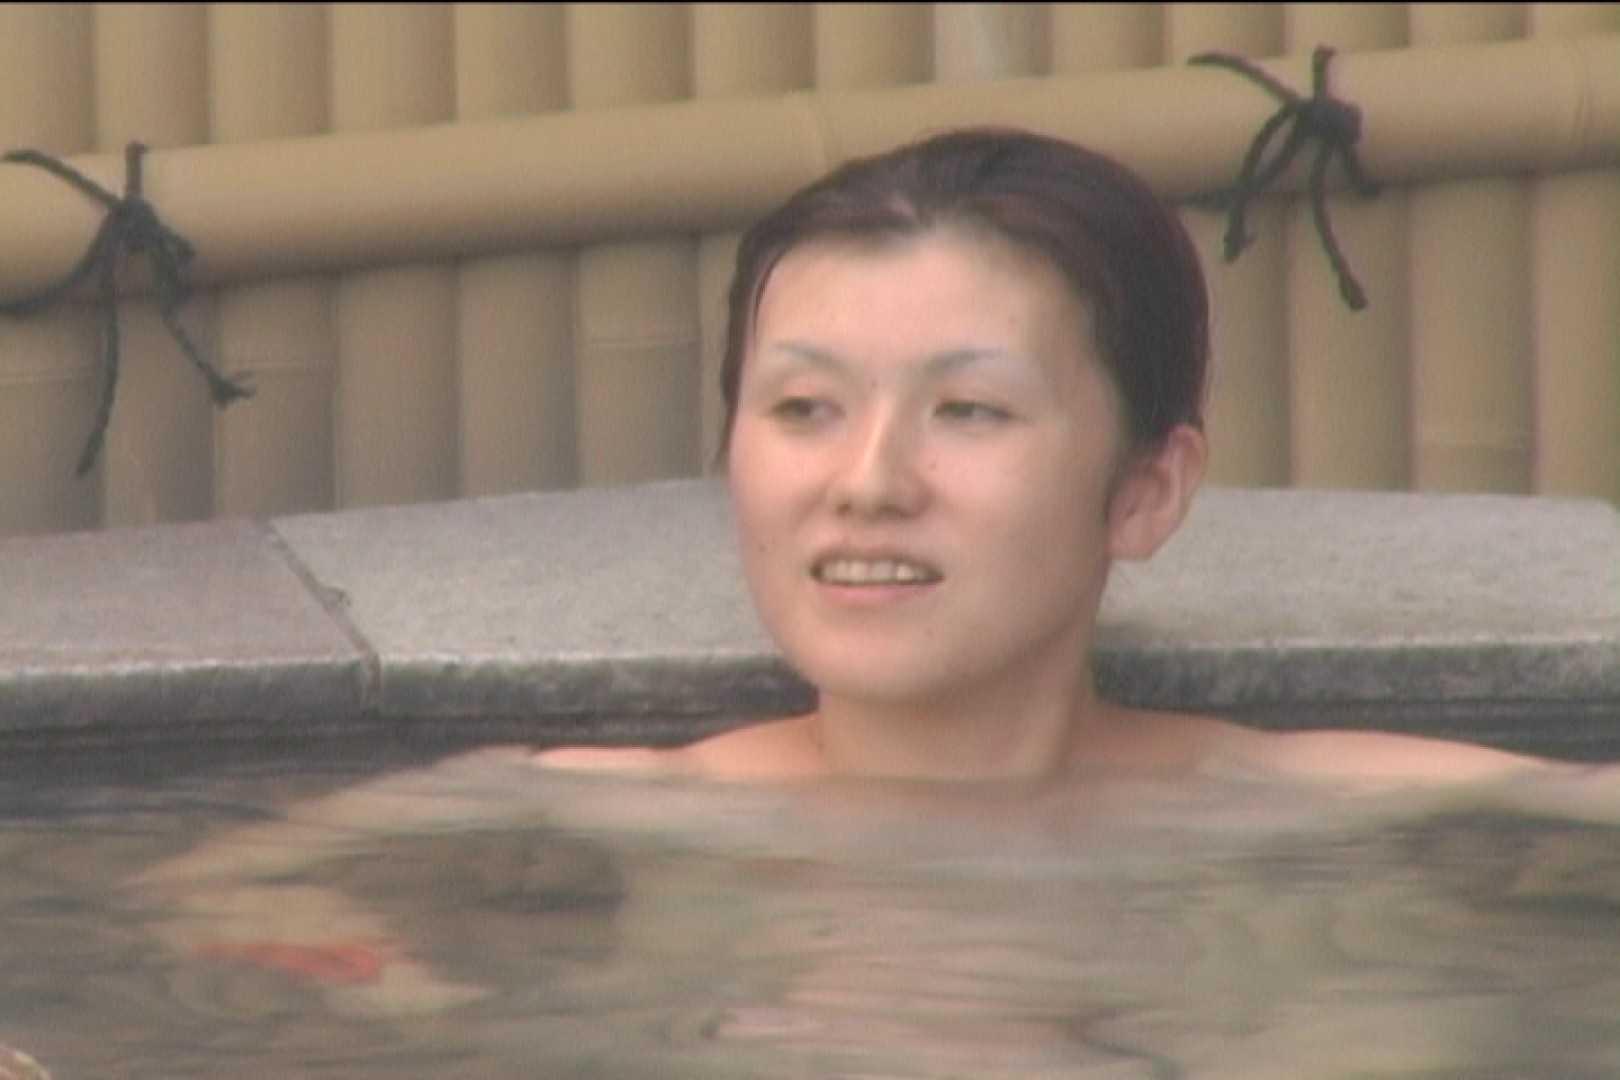 Aquaな露天風呂Vol.532 OLセックス 盗撮ワレメ無修正動画無料 105画像 62